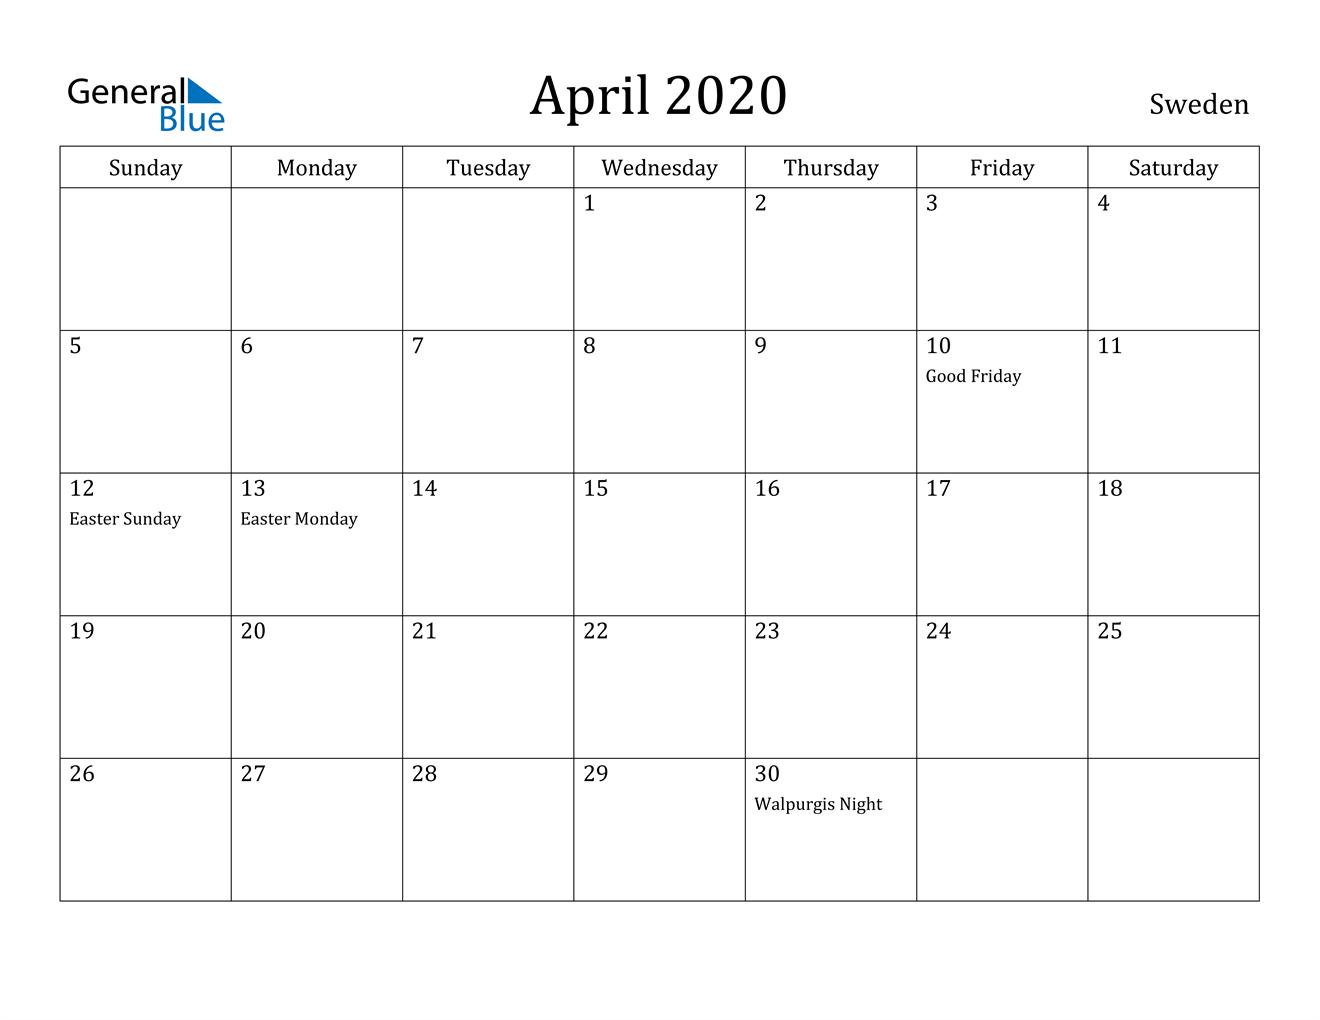 Image of April 2020 Sweden Calendar with Holidays Calendar